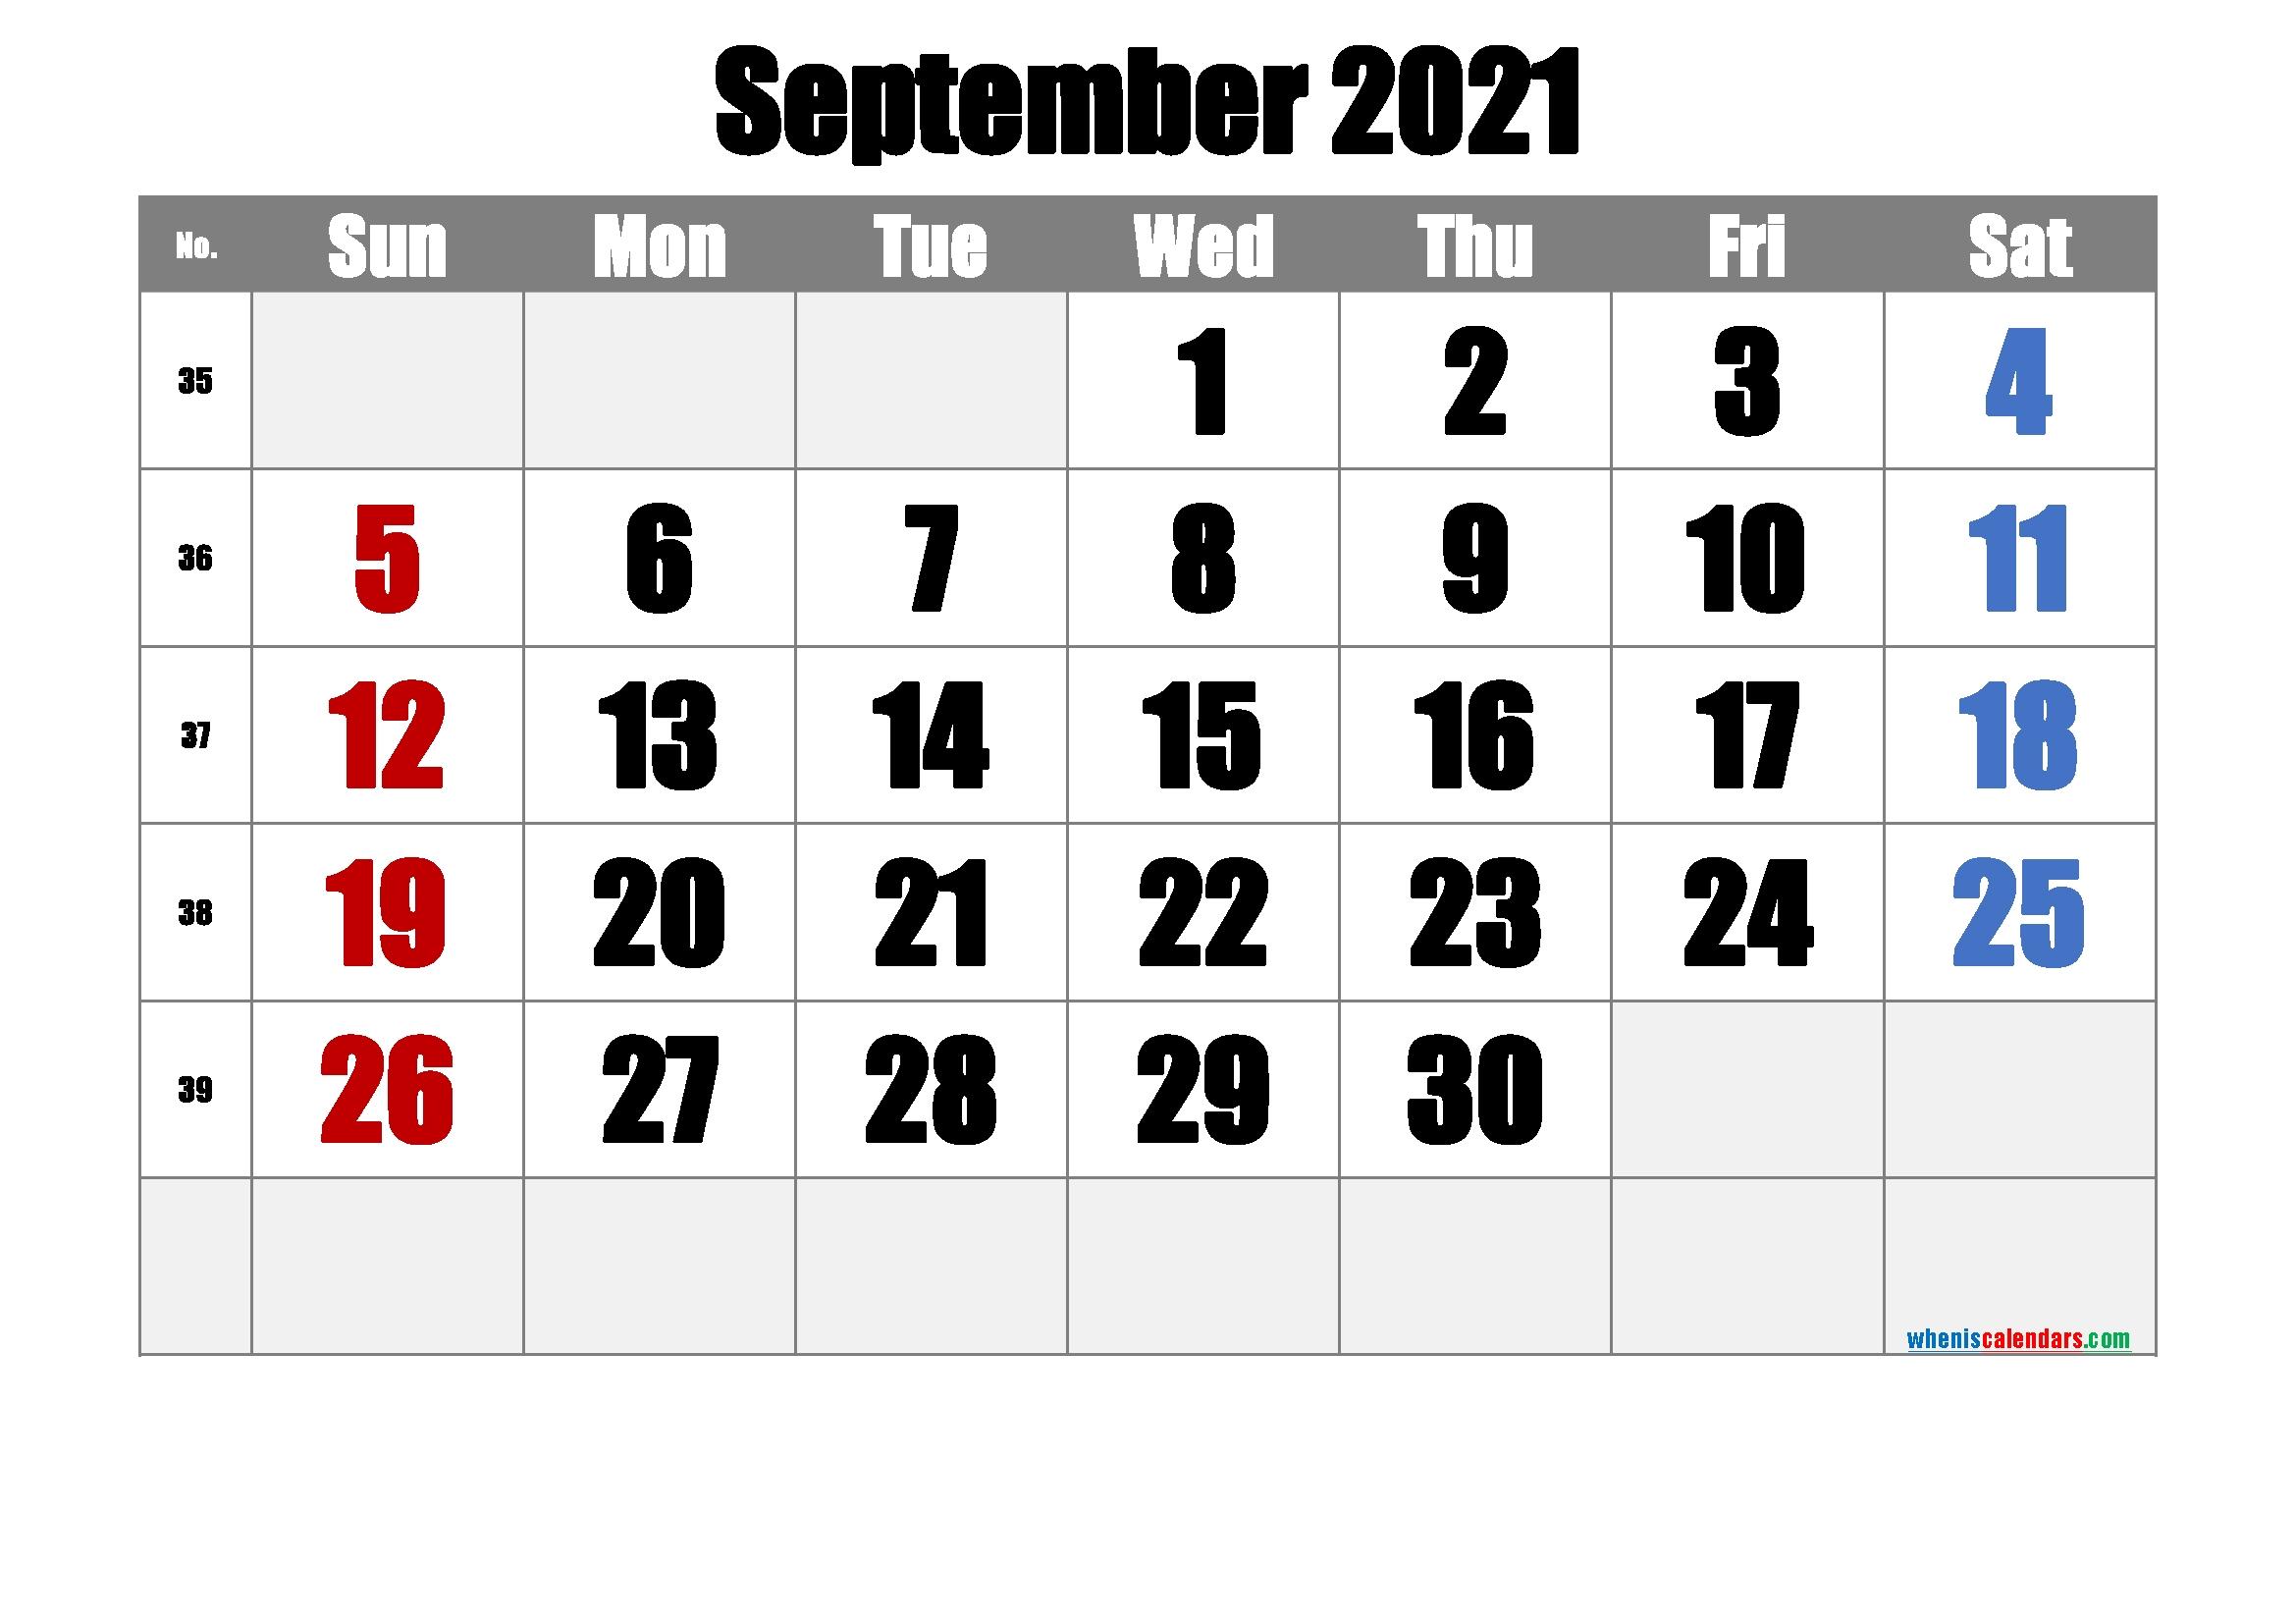 20+ September 2021 Calendar - Free Download Printable Calendar Templates ️ September 2021 Calendar Kalnirnay